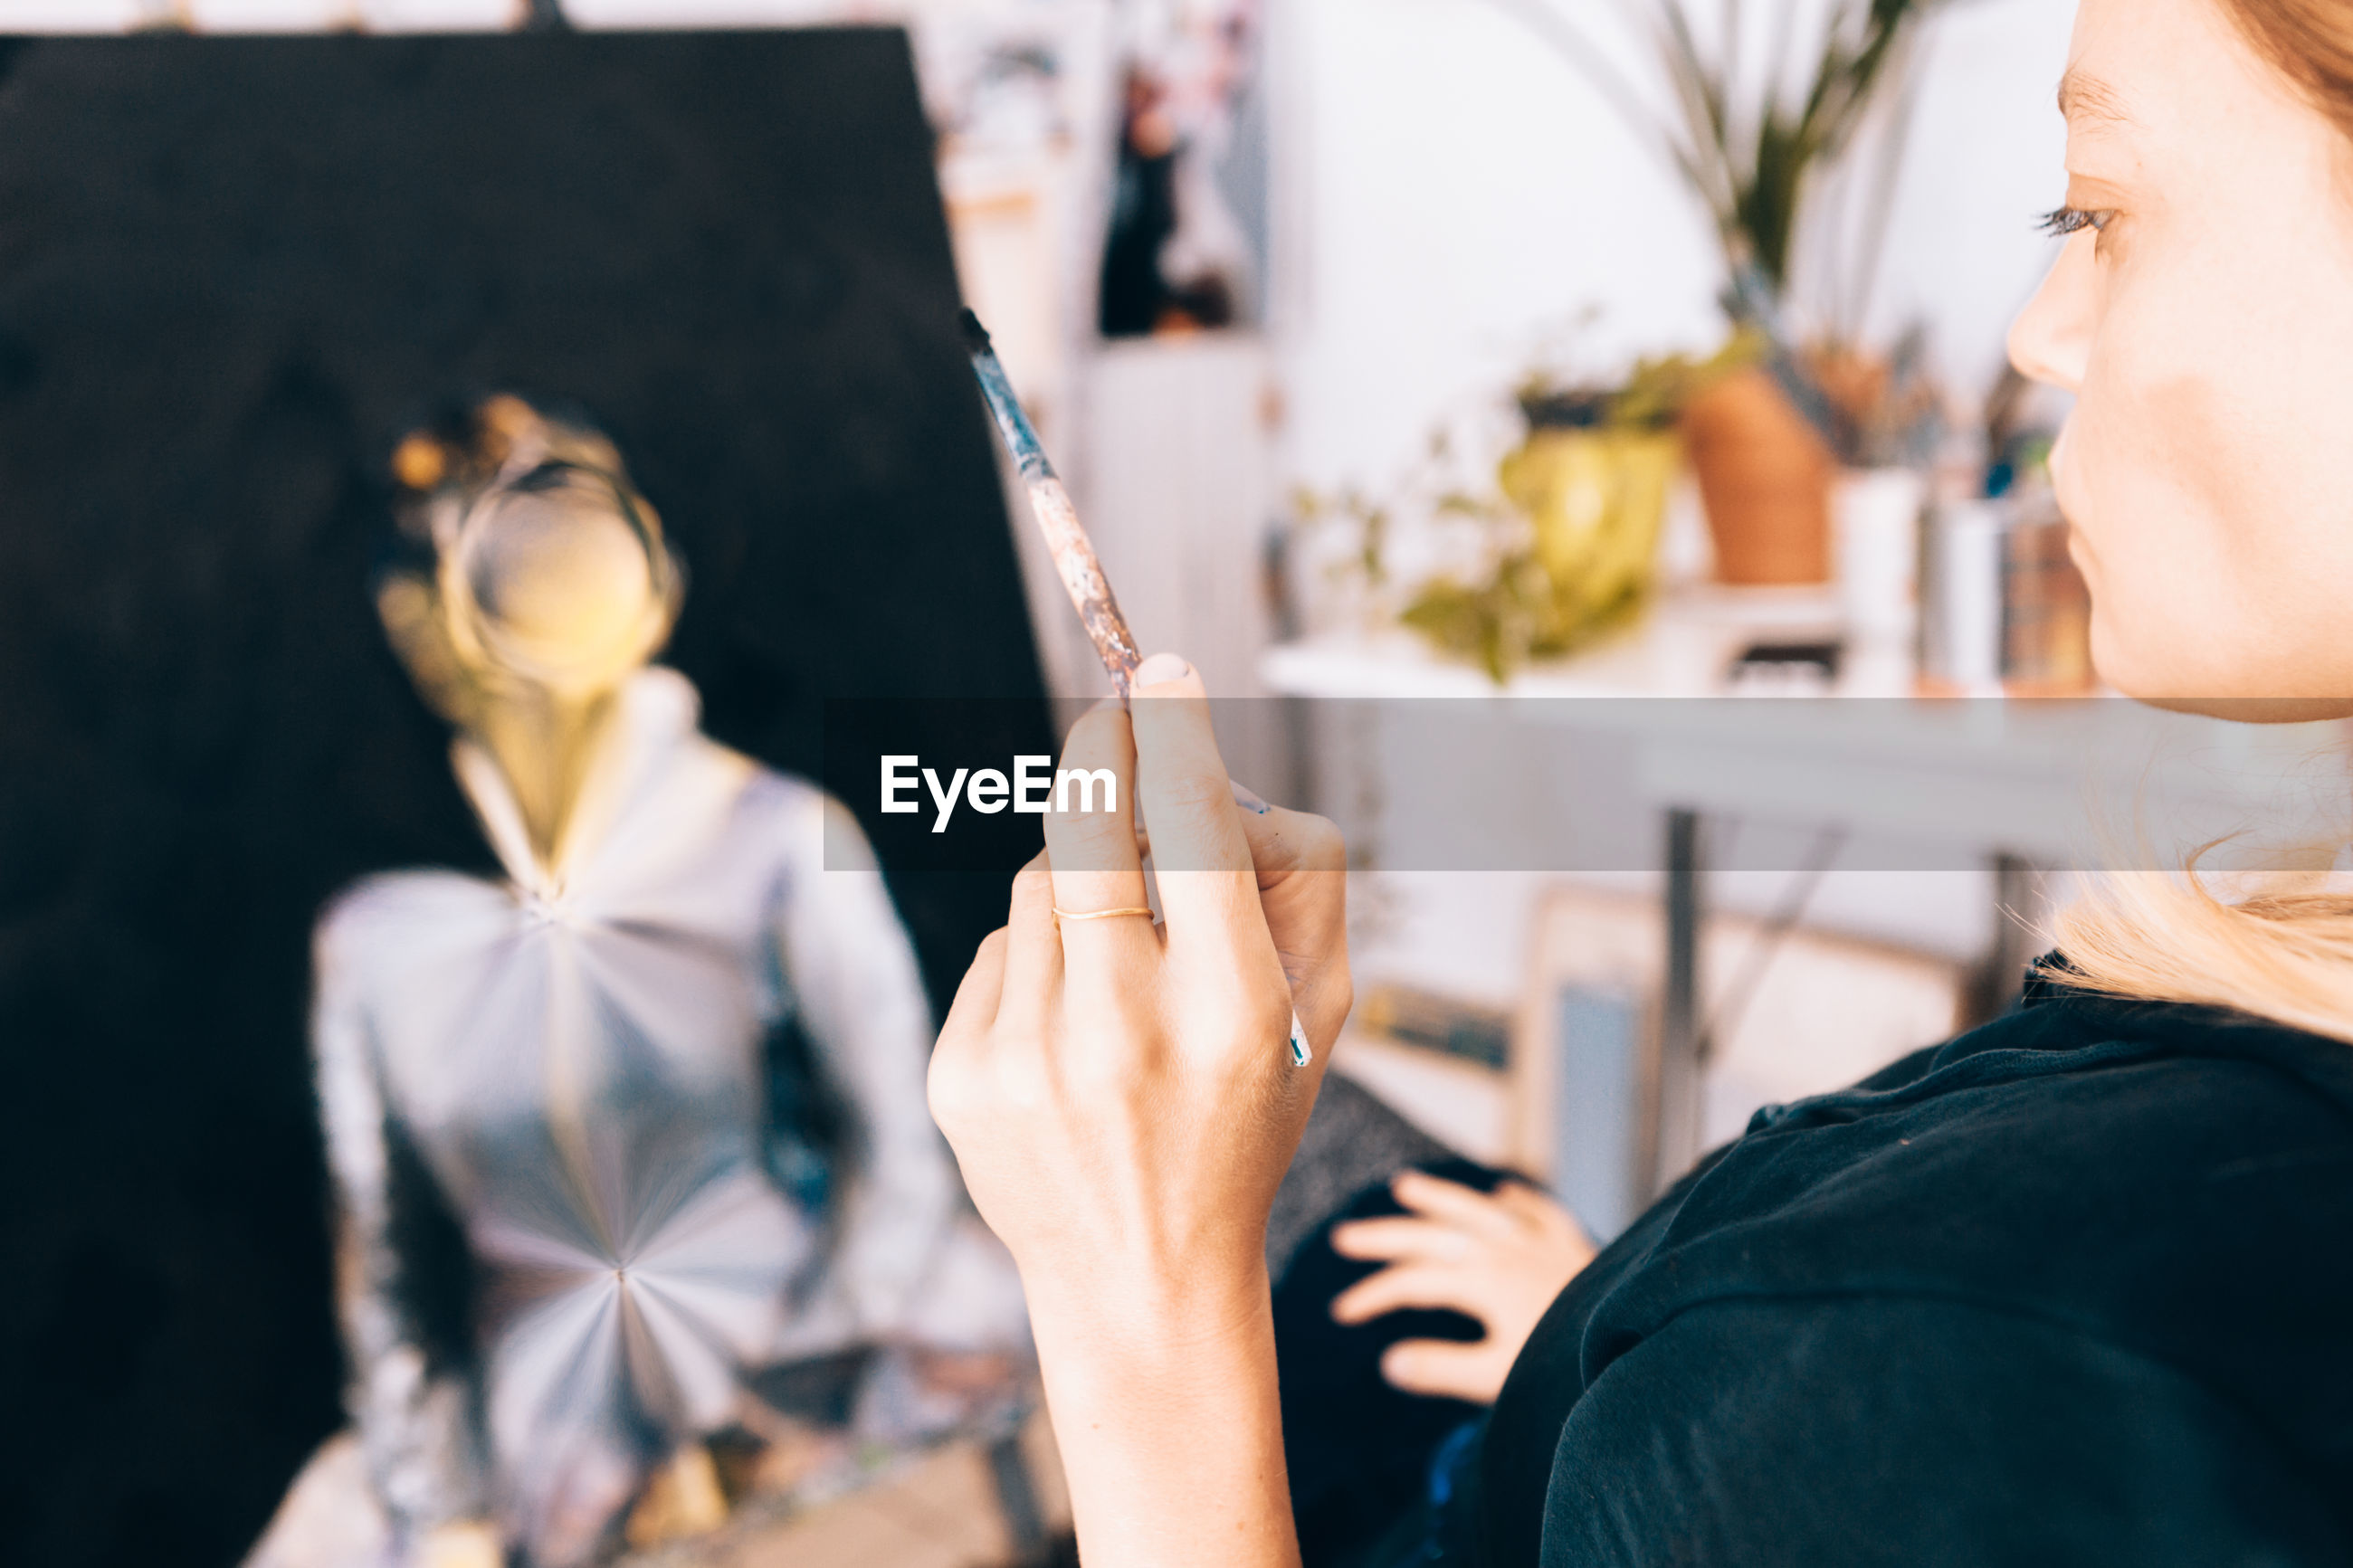 Woman painting at studio